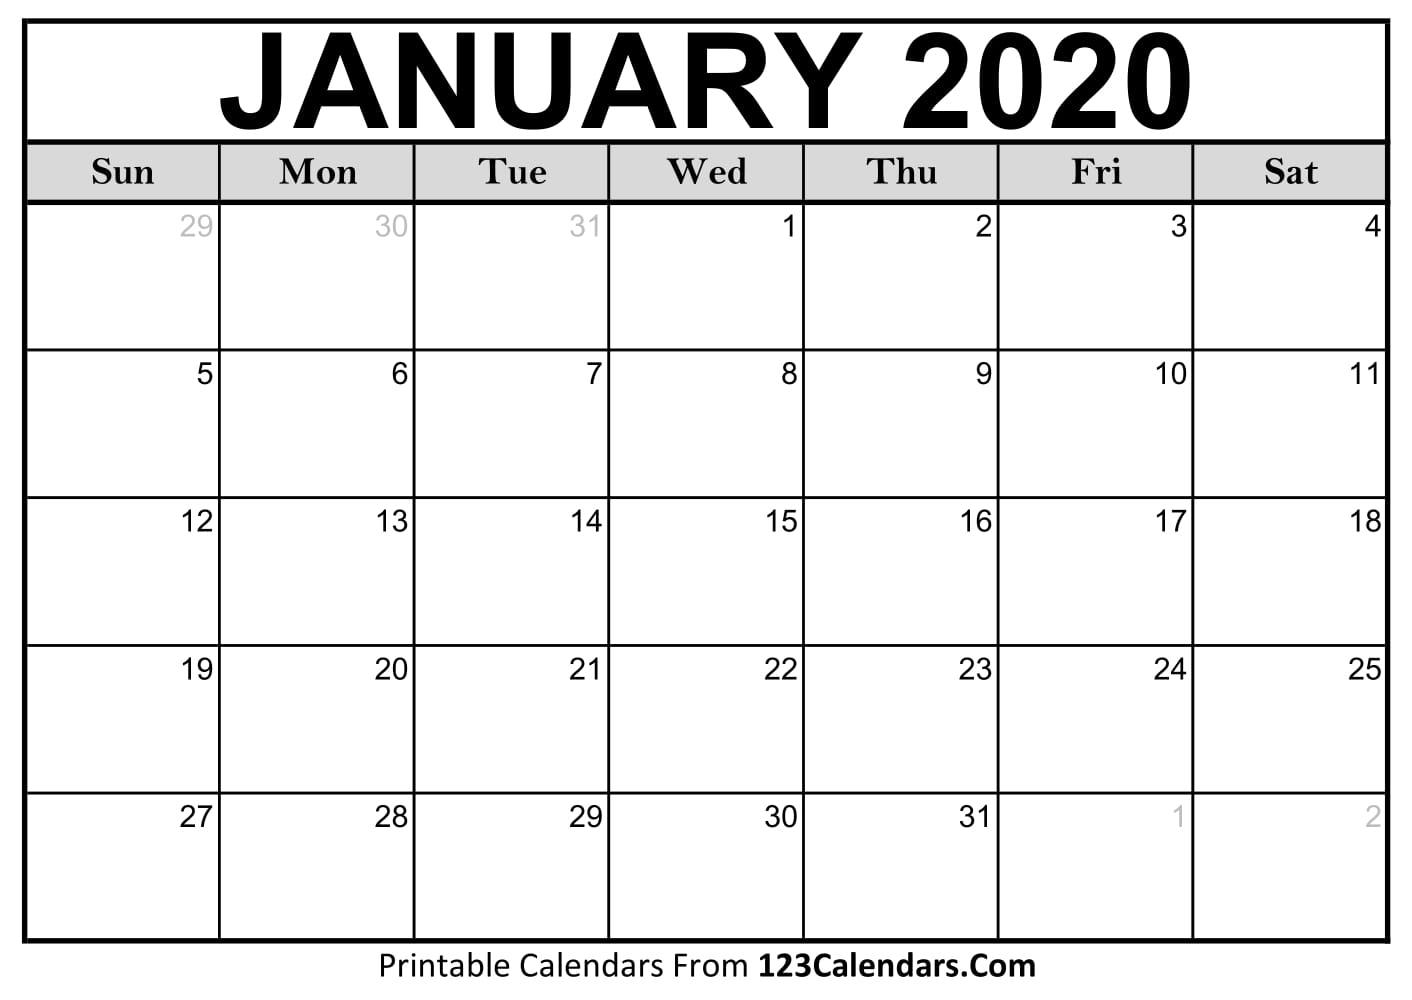 January 2020 Printable Calendar | 123Calendars regarding Blank Printable Calendar M-F